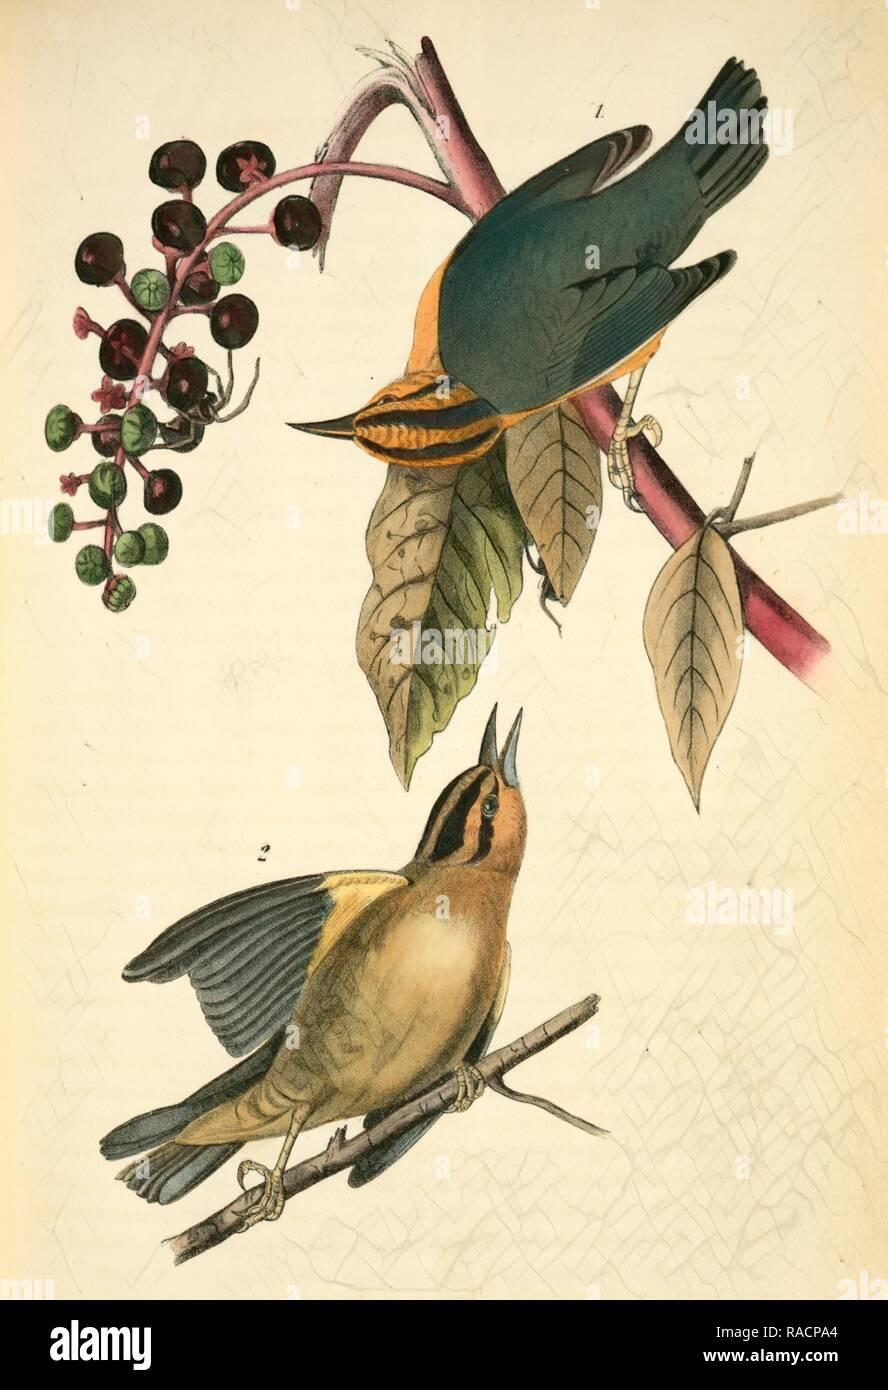 20 graines-Indien Amérique Phytolacca acinosa